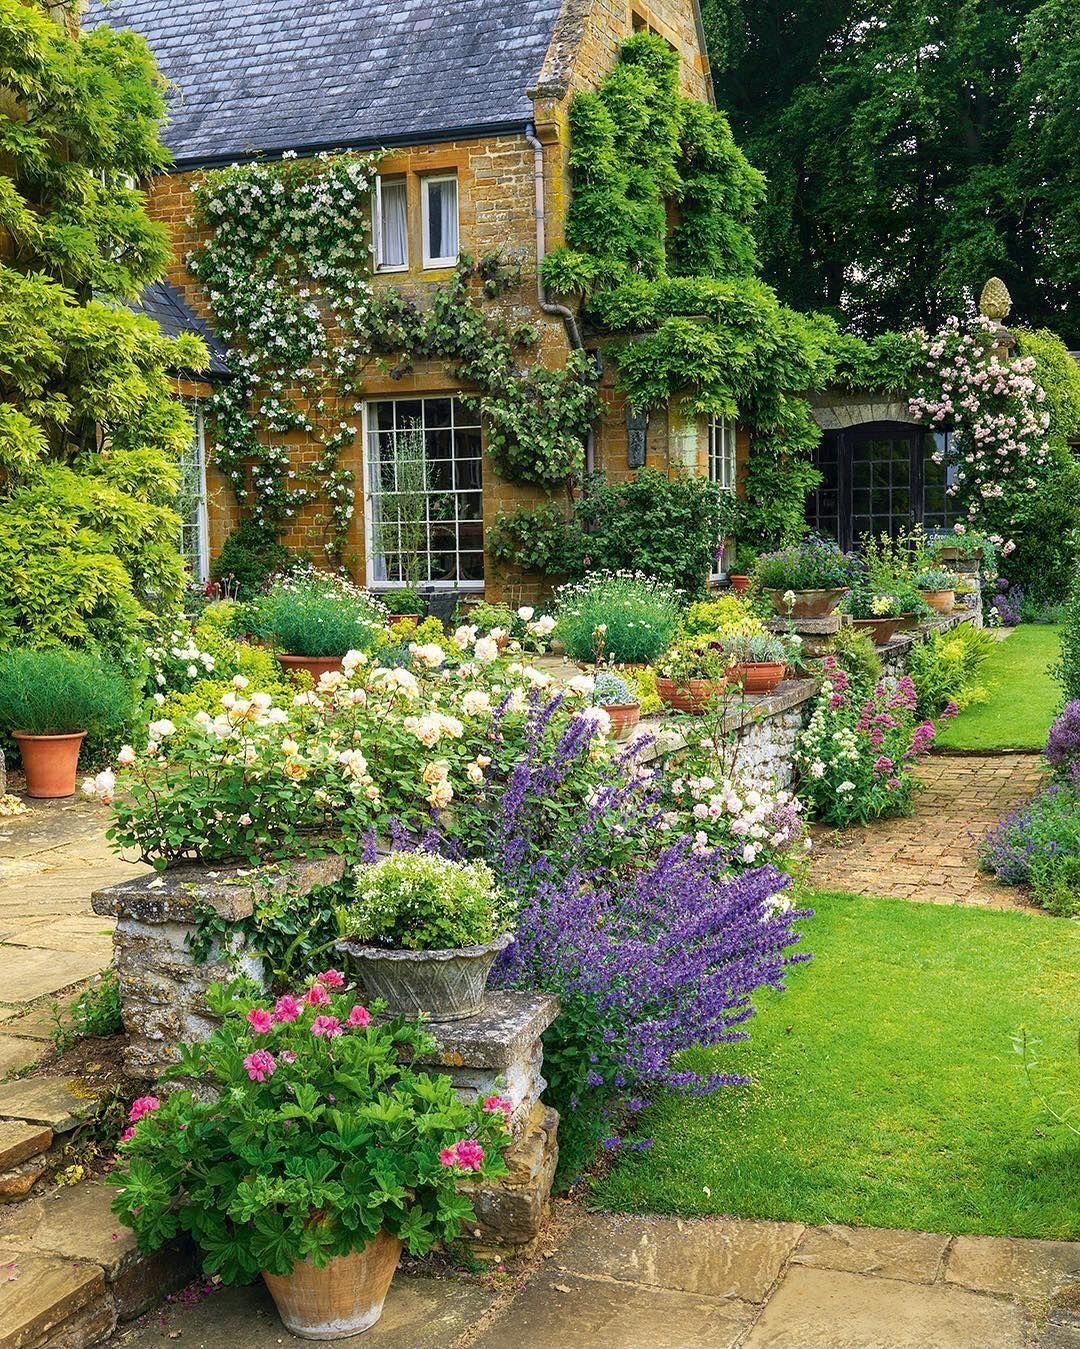 Coton Manor Northamptonshire Travel Tourism Greatbritain Vacation Britain Holidaylettings Briti Cottage Garden Cottage Garden Design Beautiful Gardens